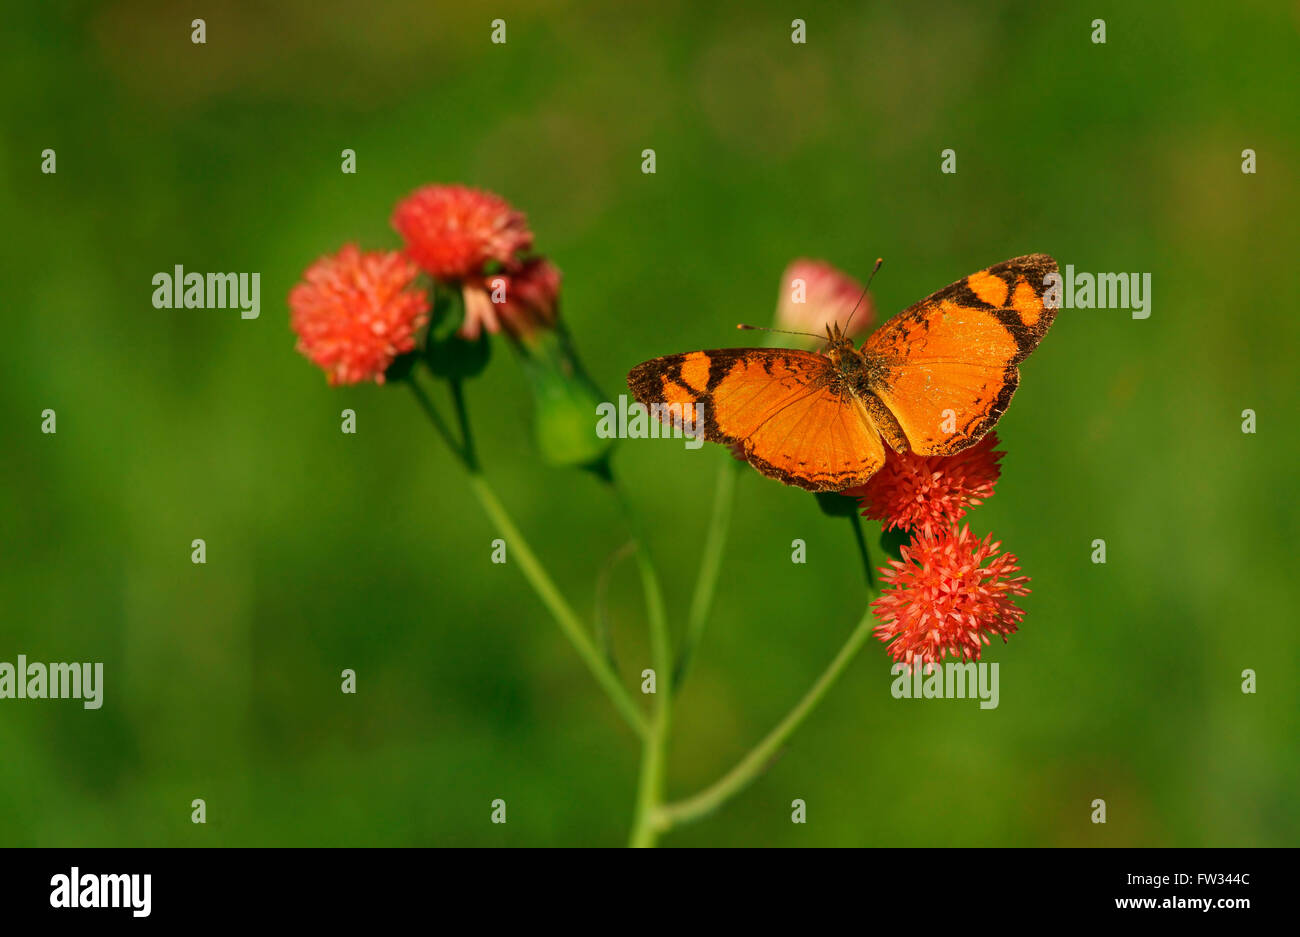 Nymphalidae (Nymphidae) farfalle tropicali (Argyrogrammana sticheli), Iguazú National Park, Paraná, Brasile Immagini Stock